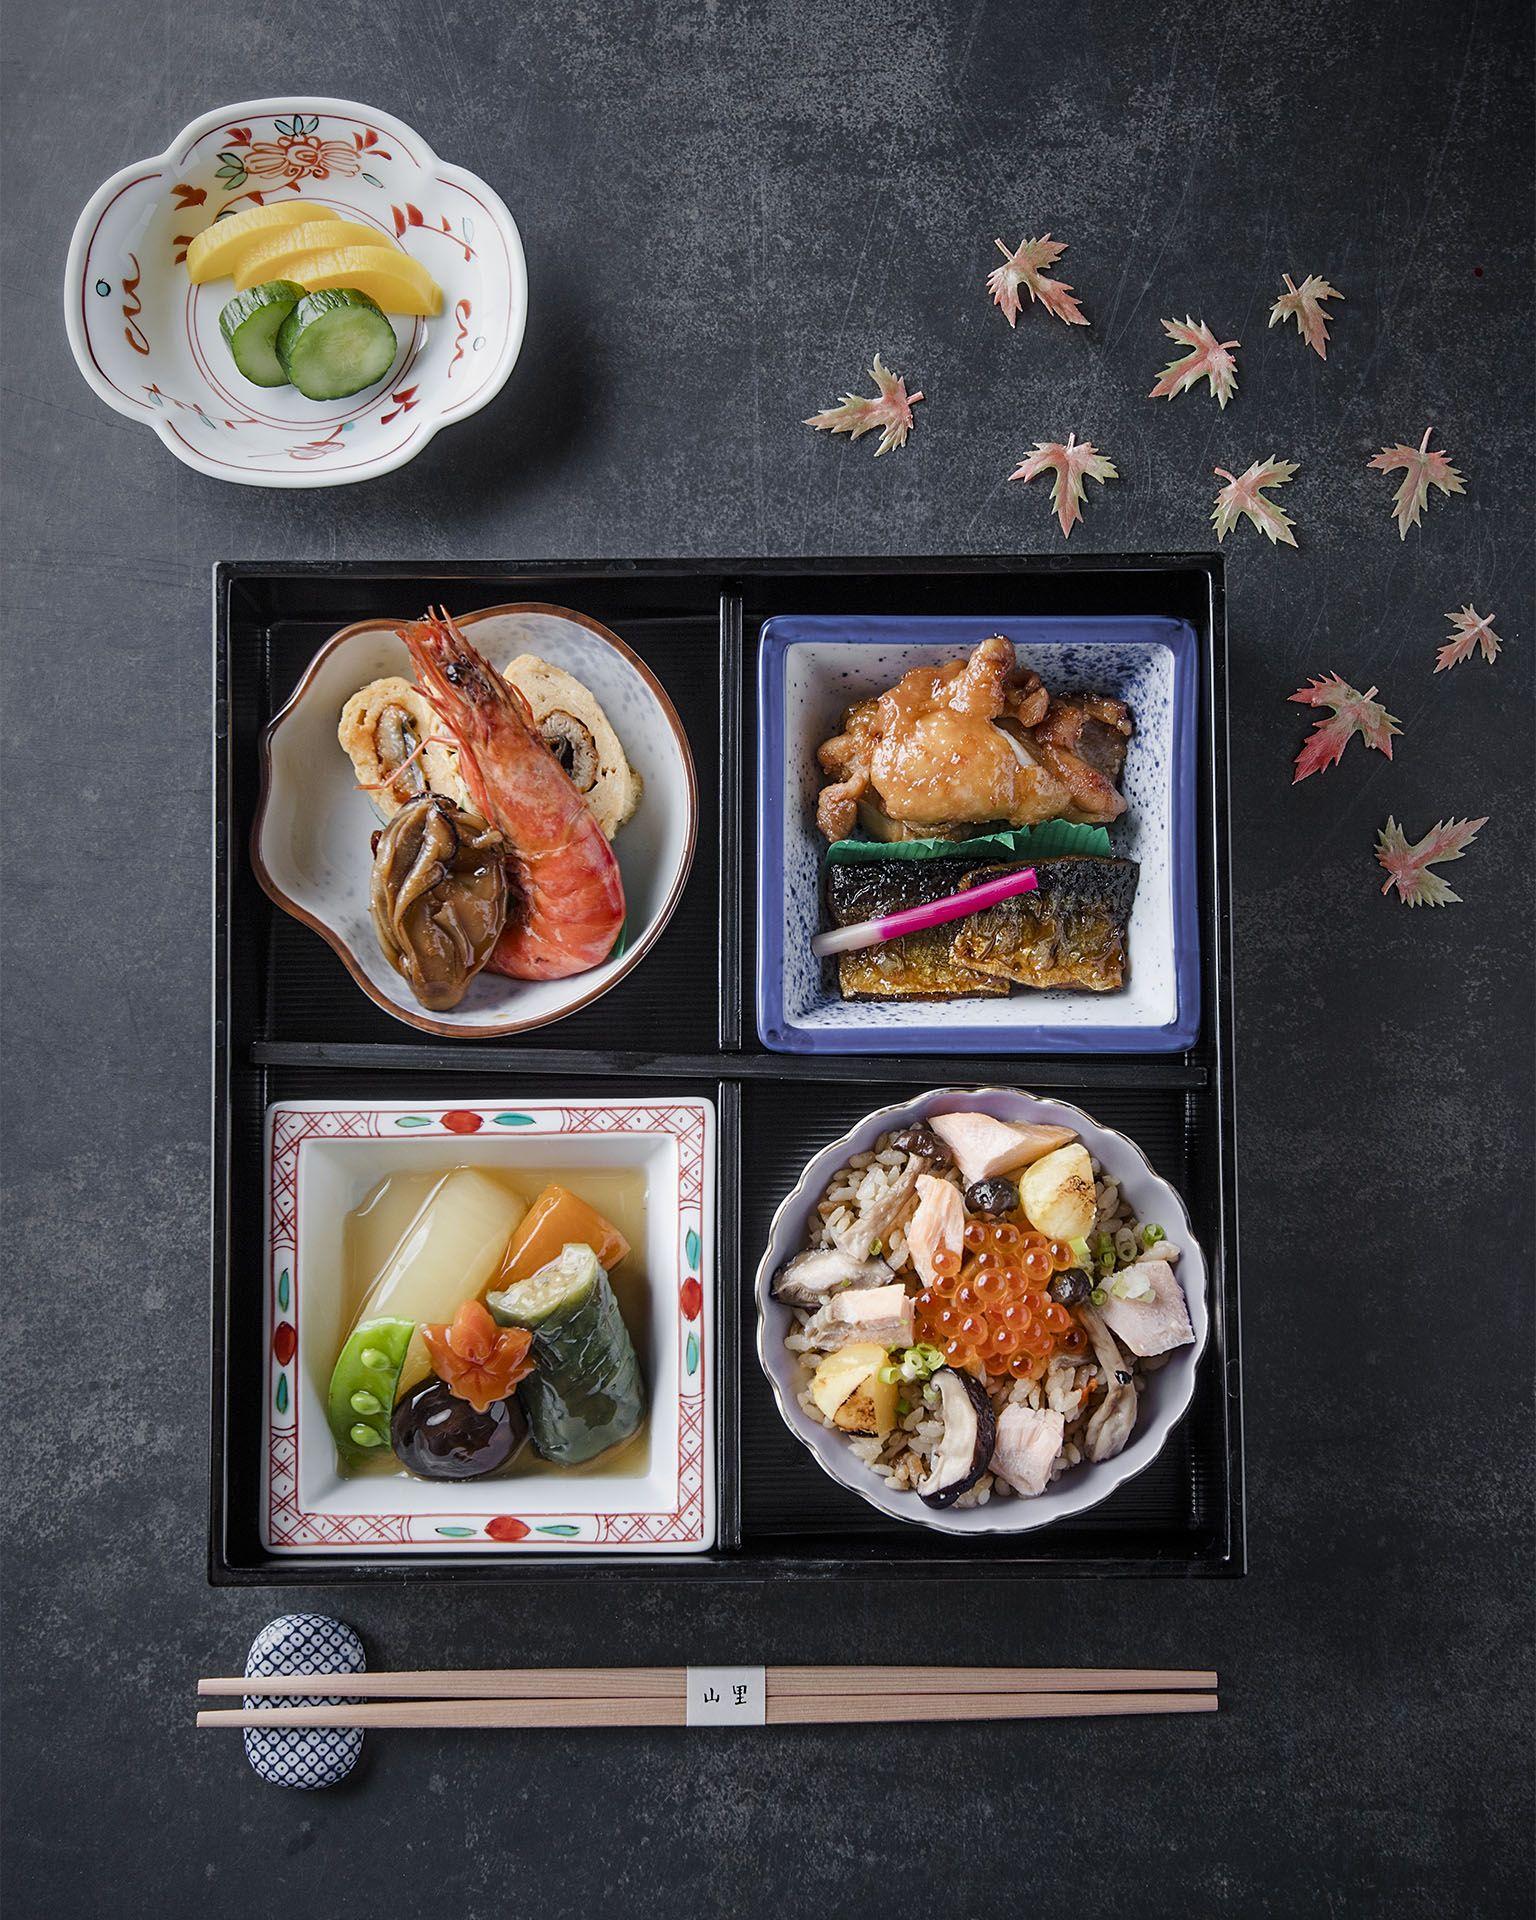 Hotel Okura's Yamazato Launches New Set Menus For Autumn